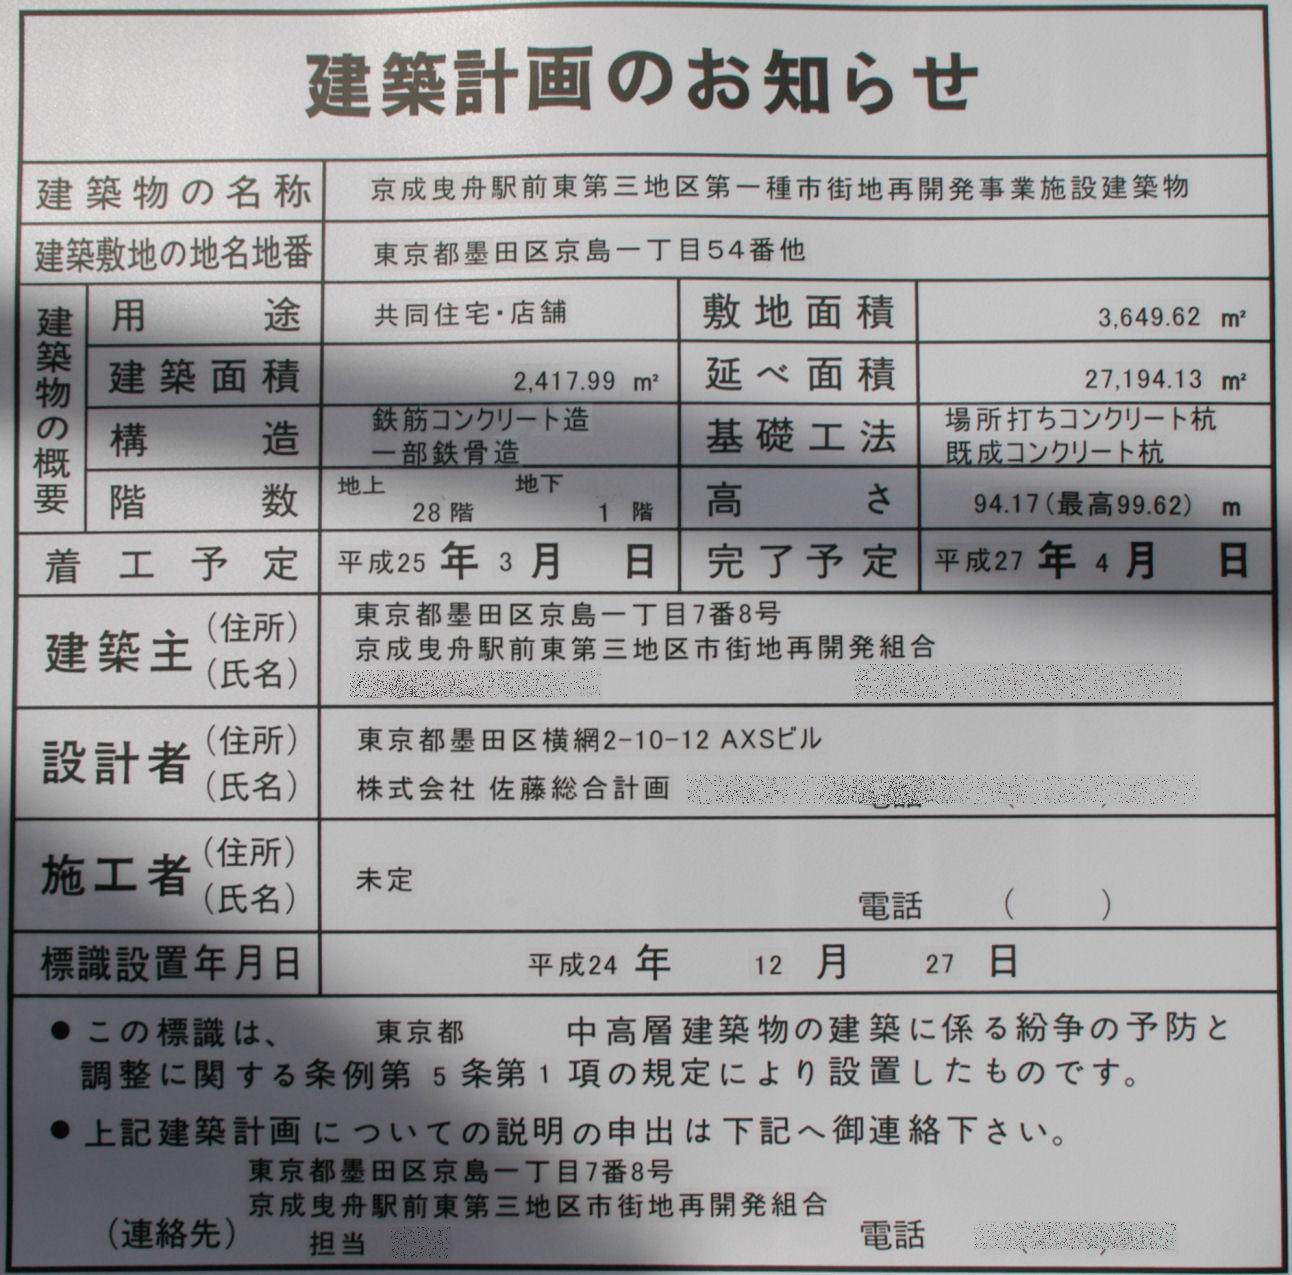 hikifune313020091.jpg